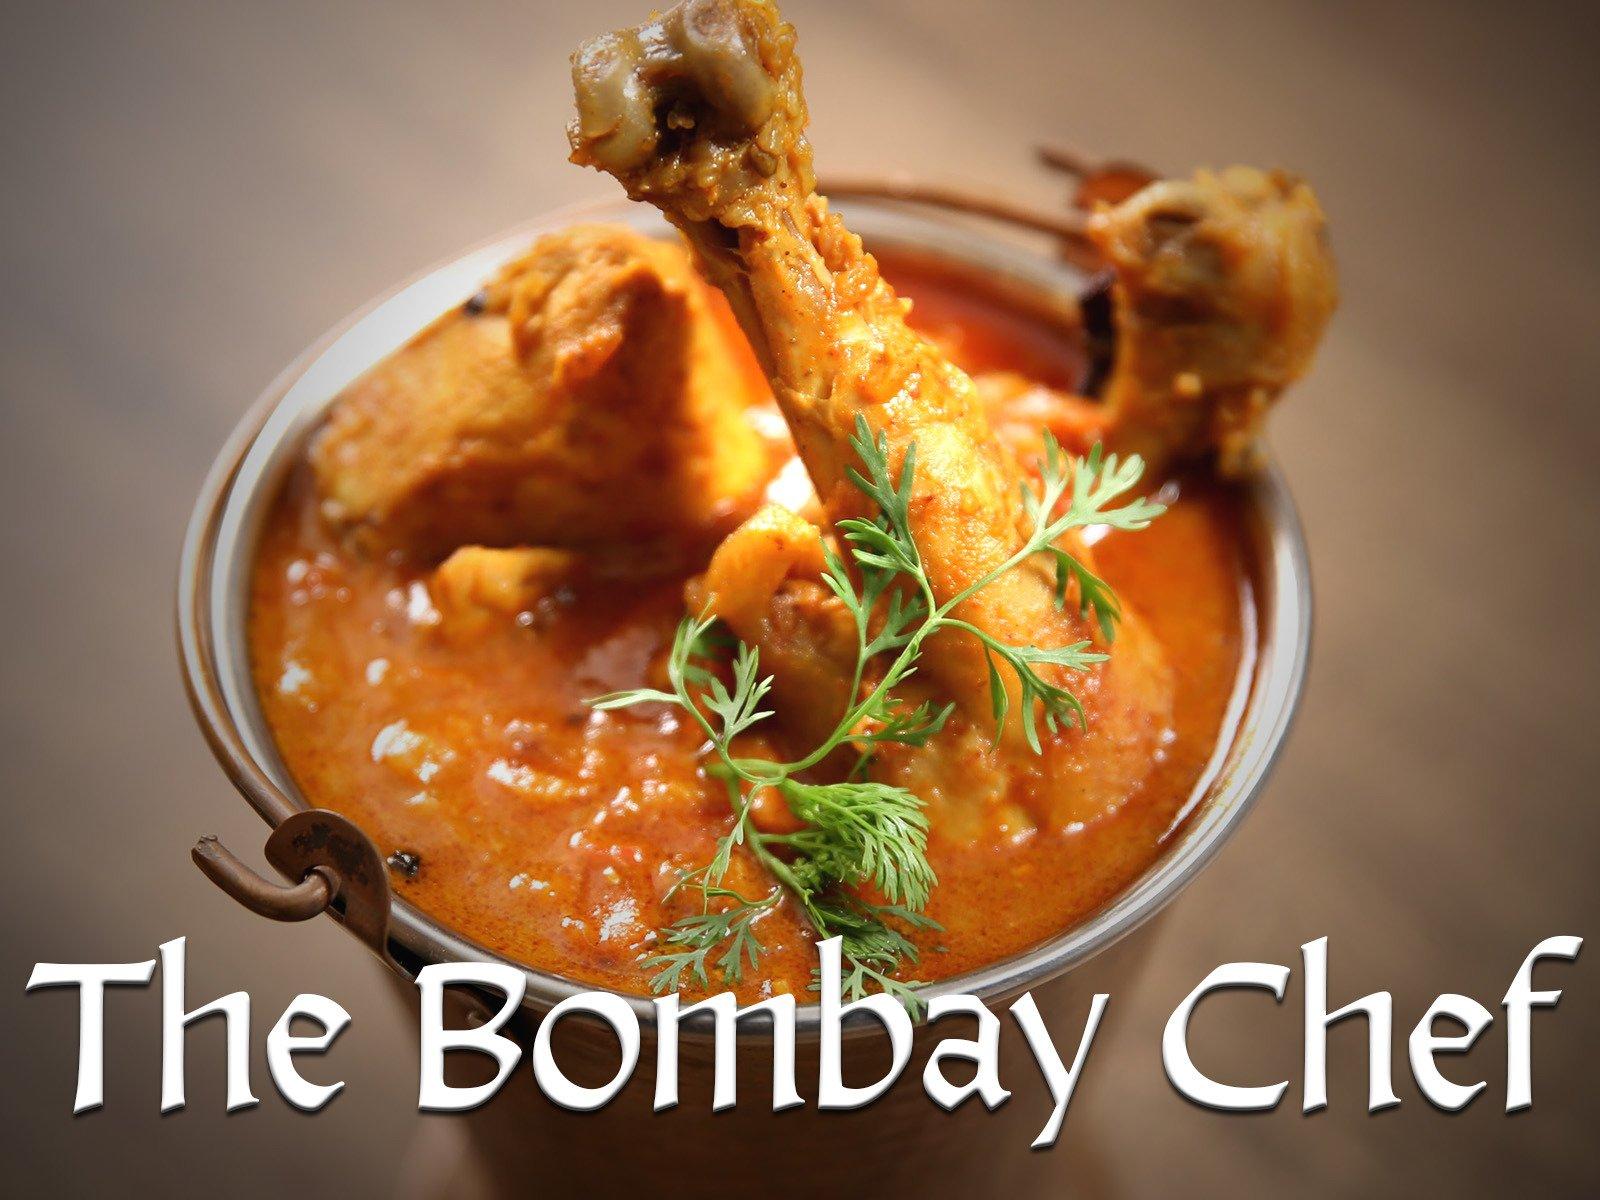 The Bombay Chef - Season 1